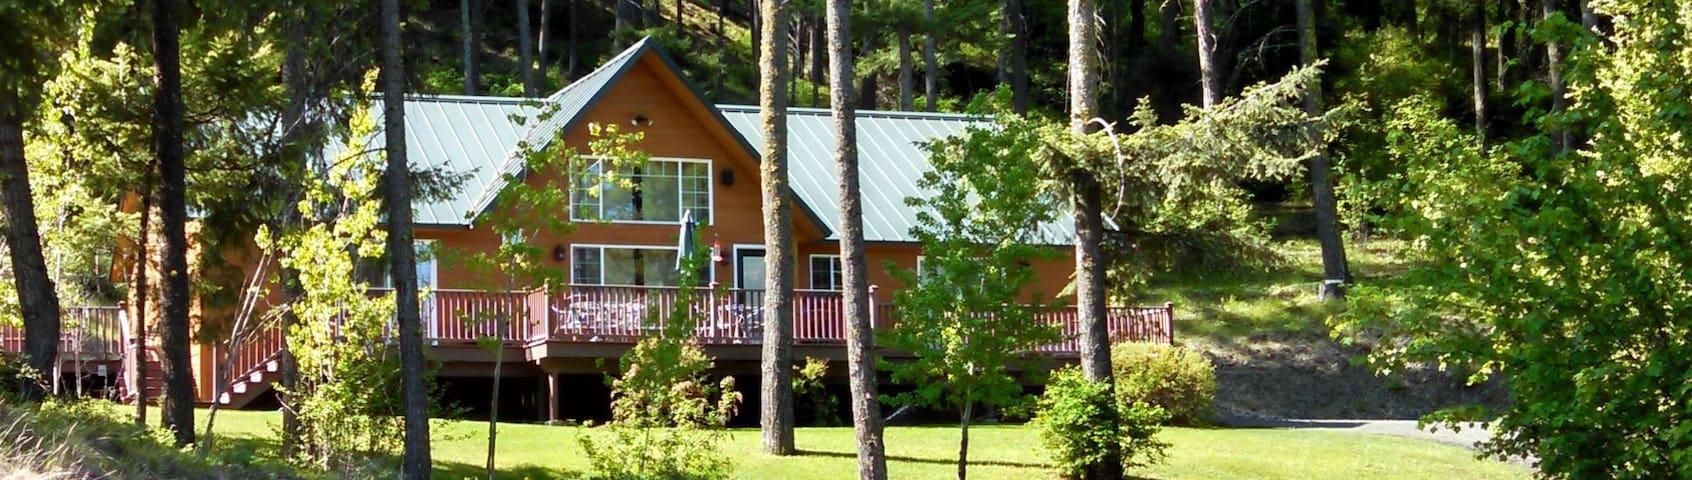 Luxurious Carmack Creek Lodge